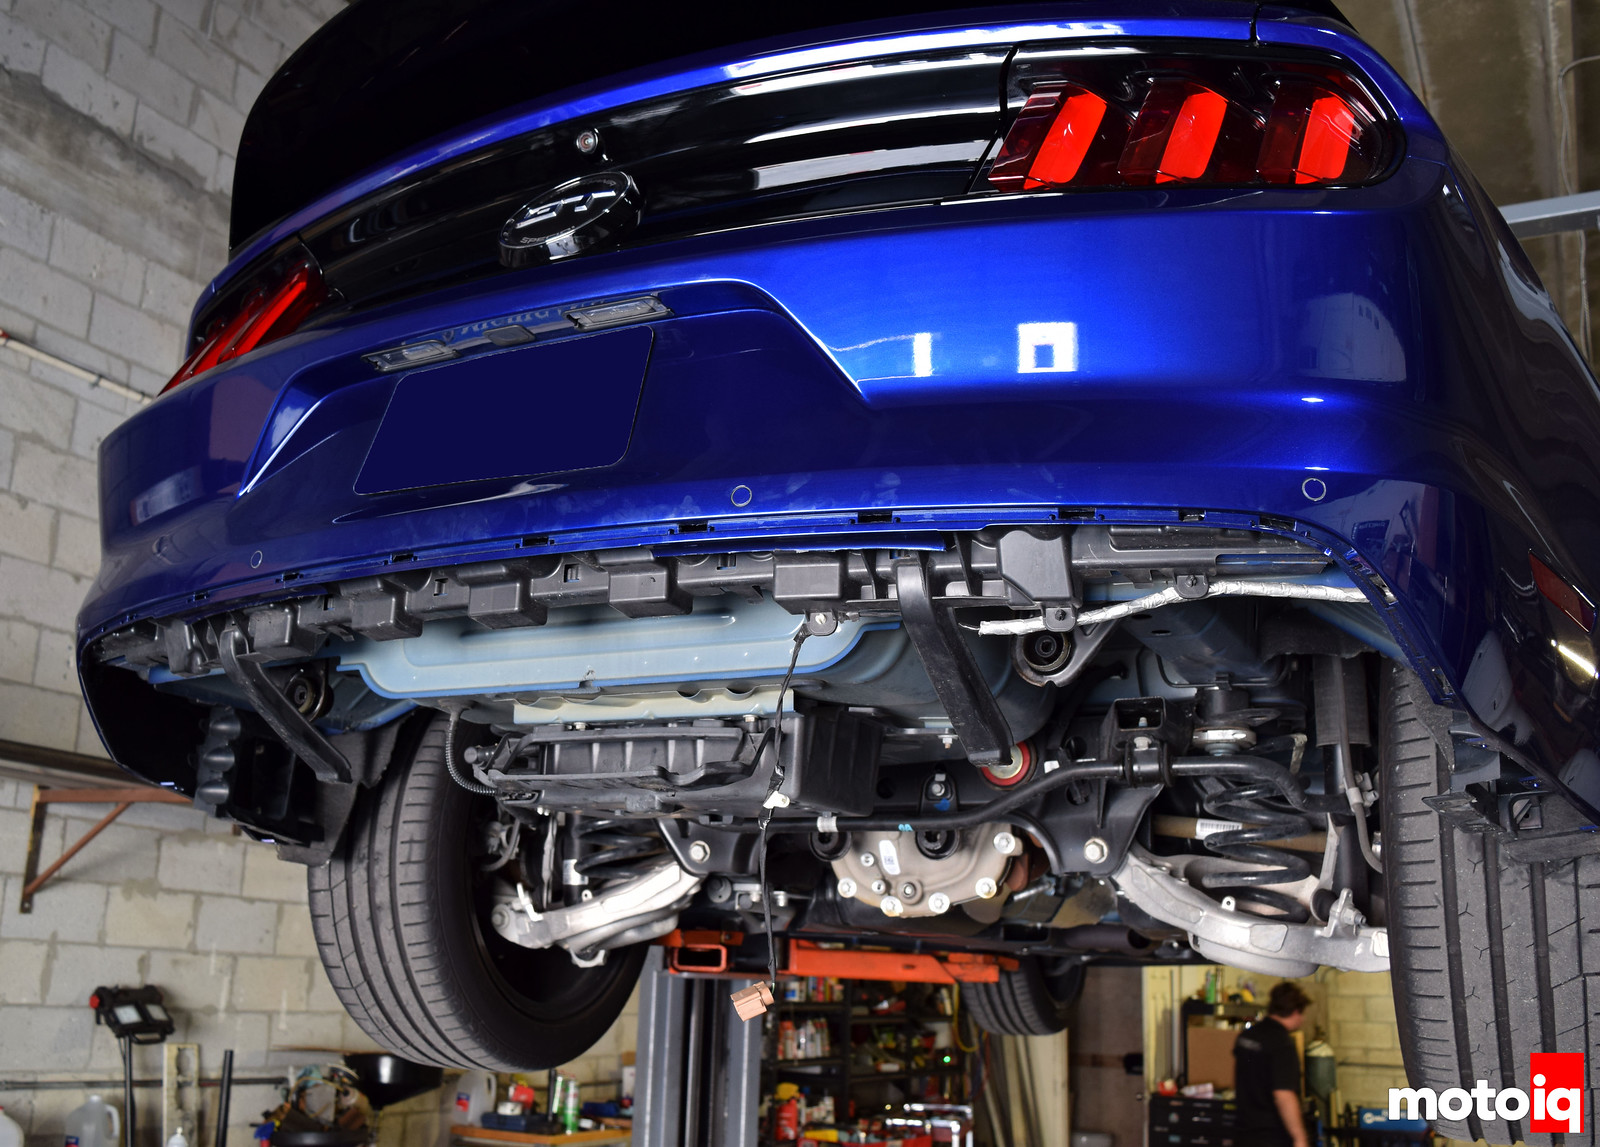 2015 Mustang GT rear diffuser cut off